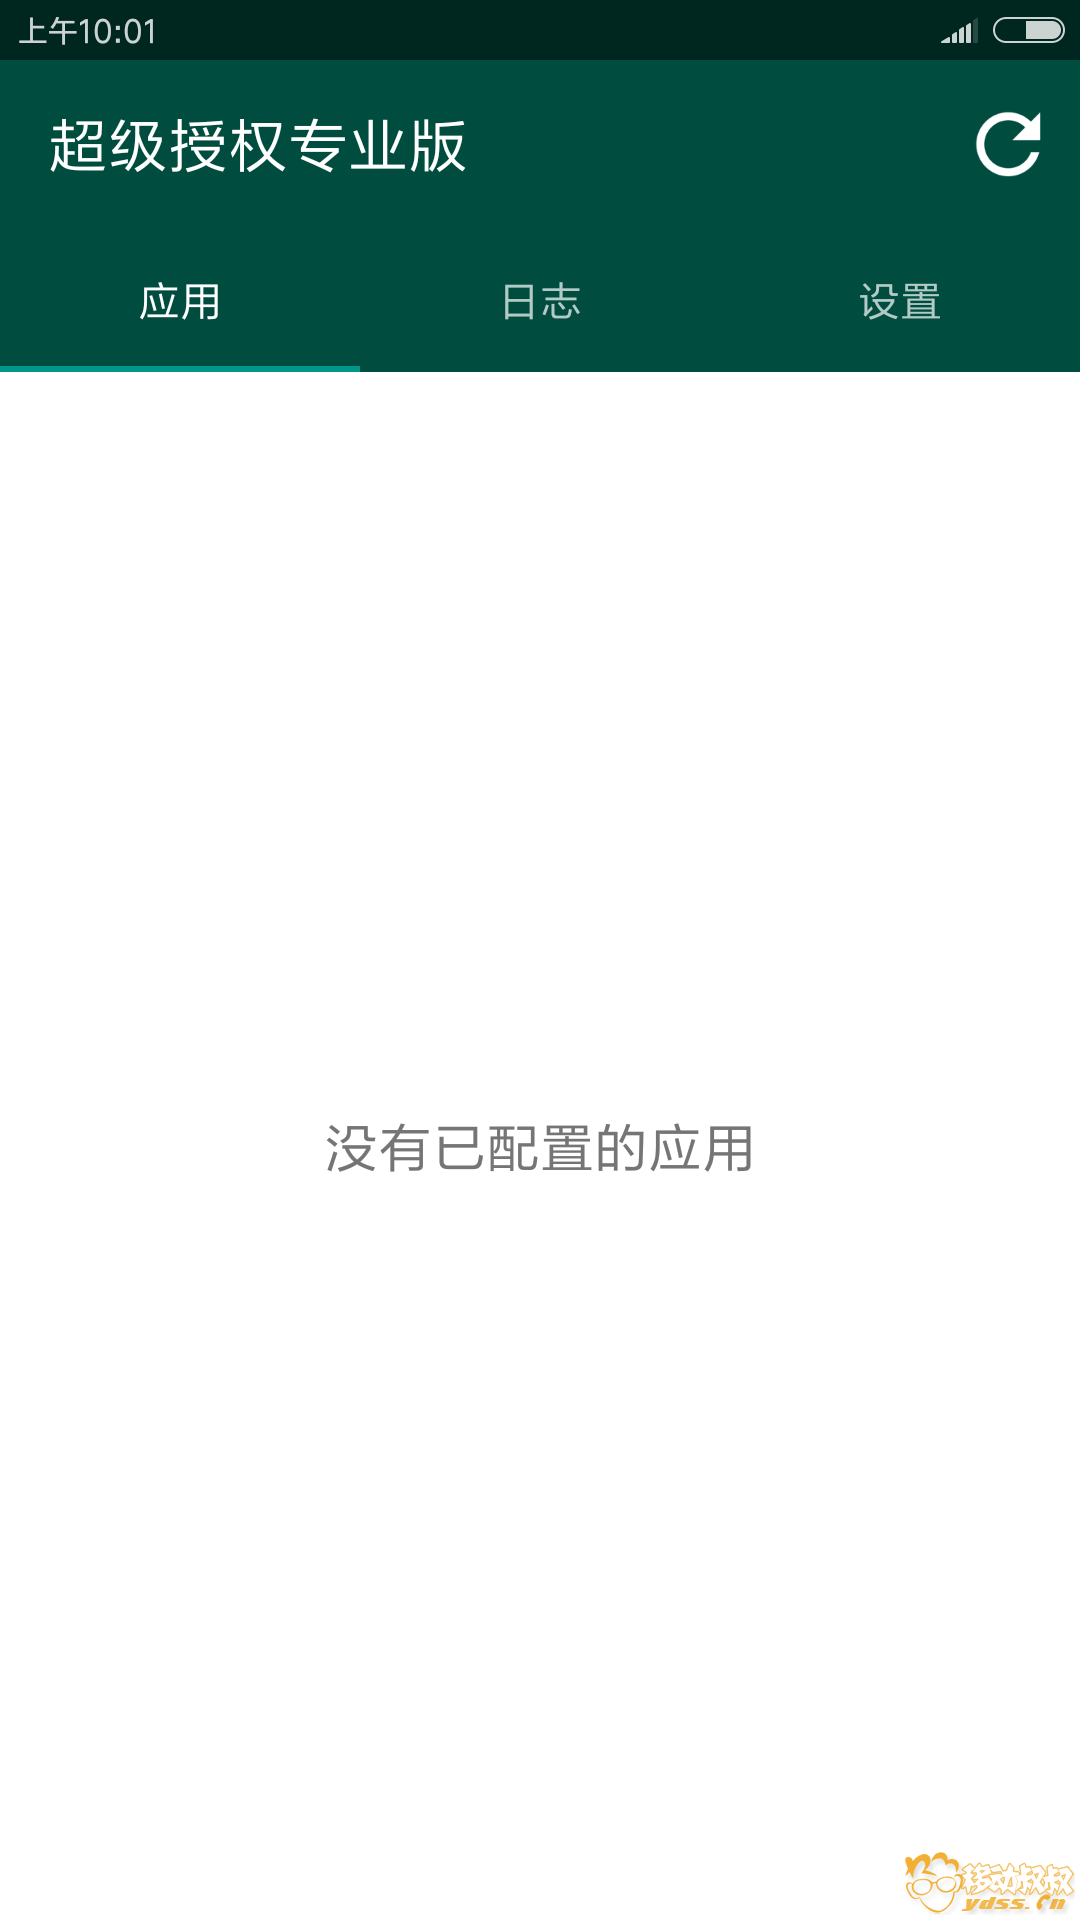 Screenshot_2017-05-17-10-01-23-864_eu.chainfire.supersu.png